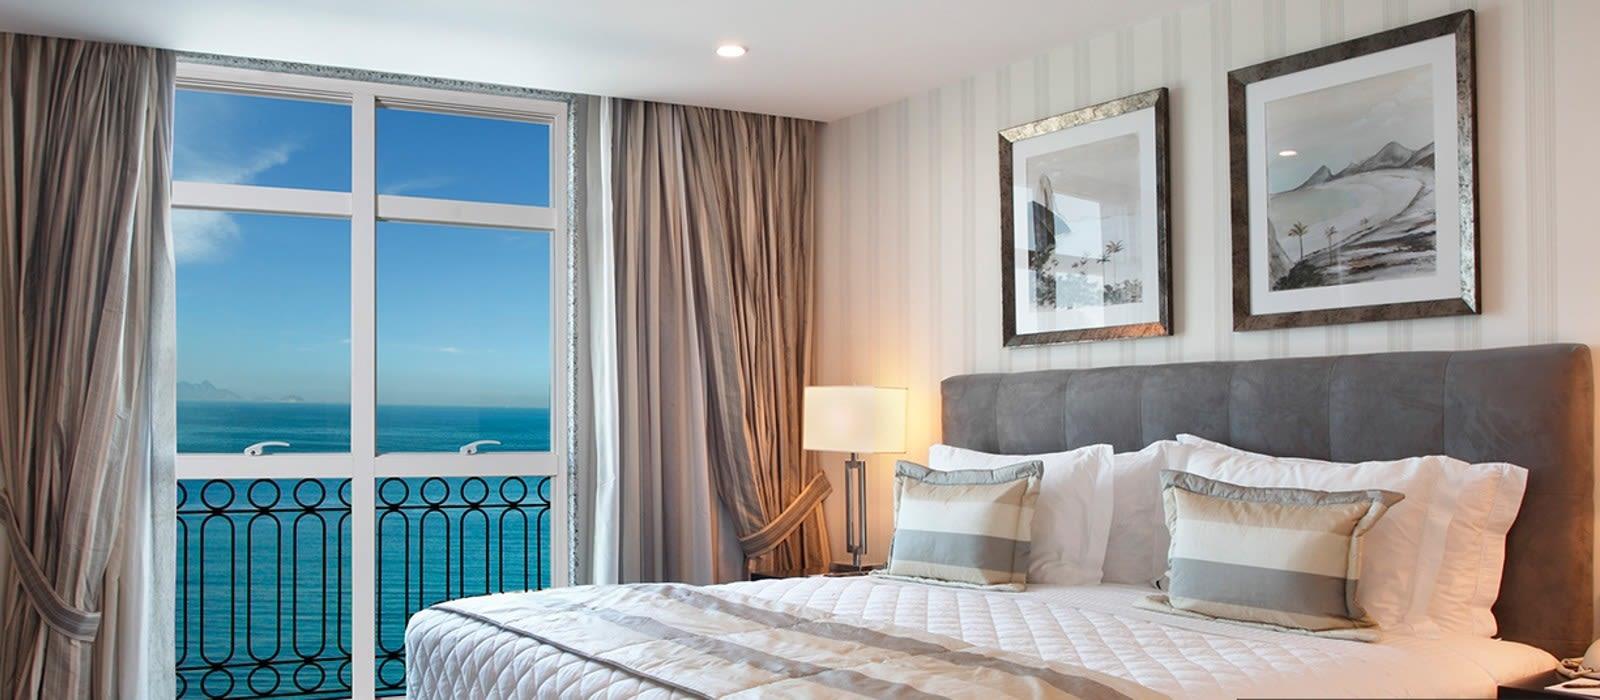 Hotel Miramar  by Windsor Brazil